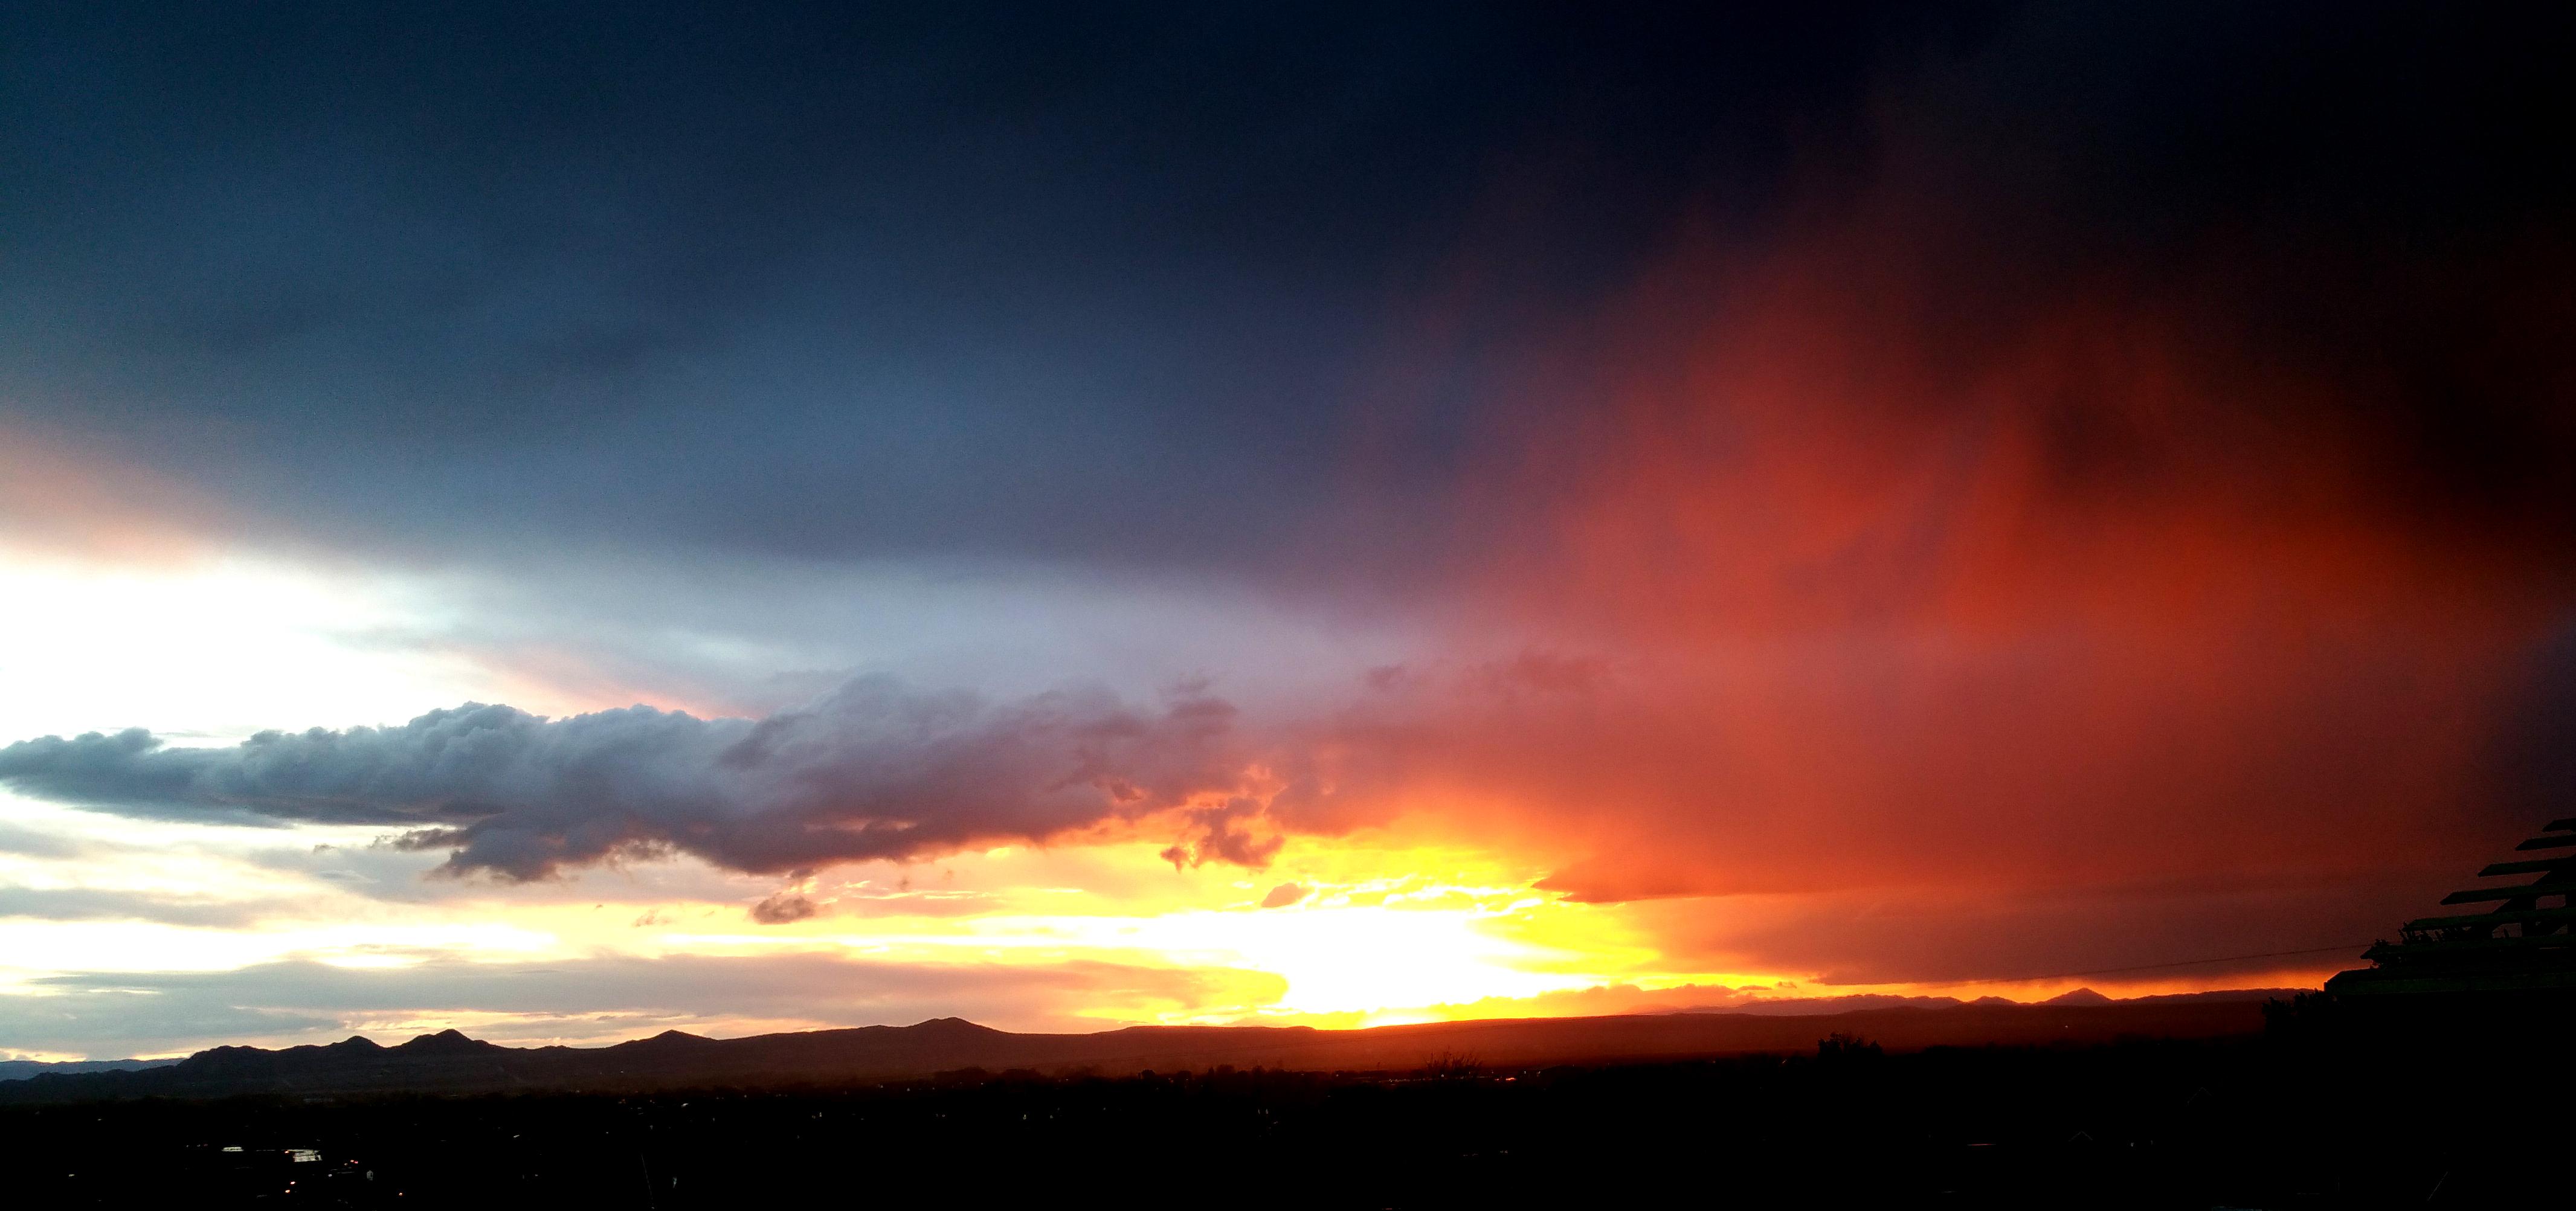 Enoch, Utah Sunset